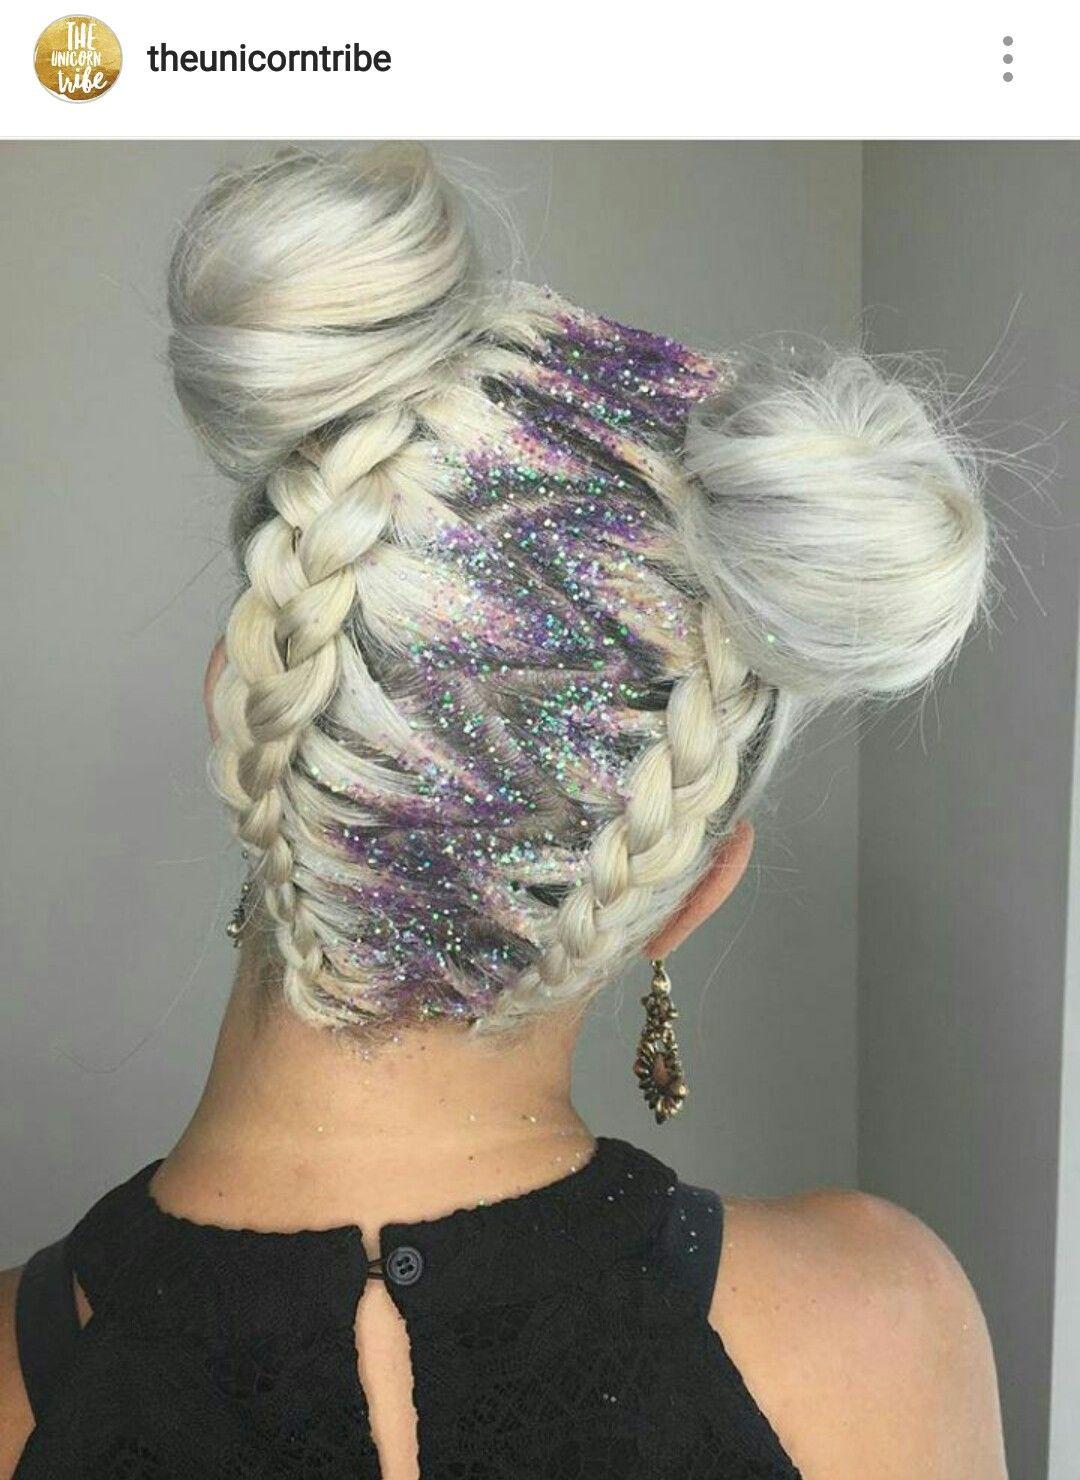 Space Buns Hair Style With Glitter Hair Hair